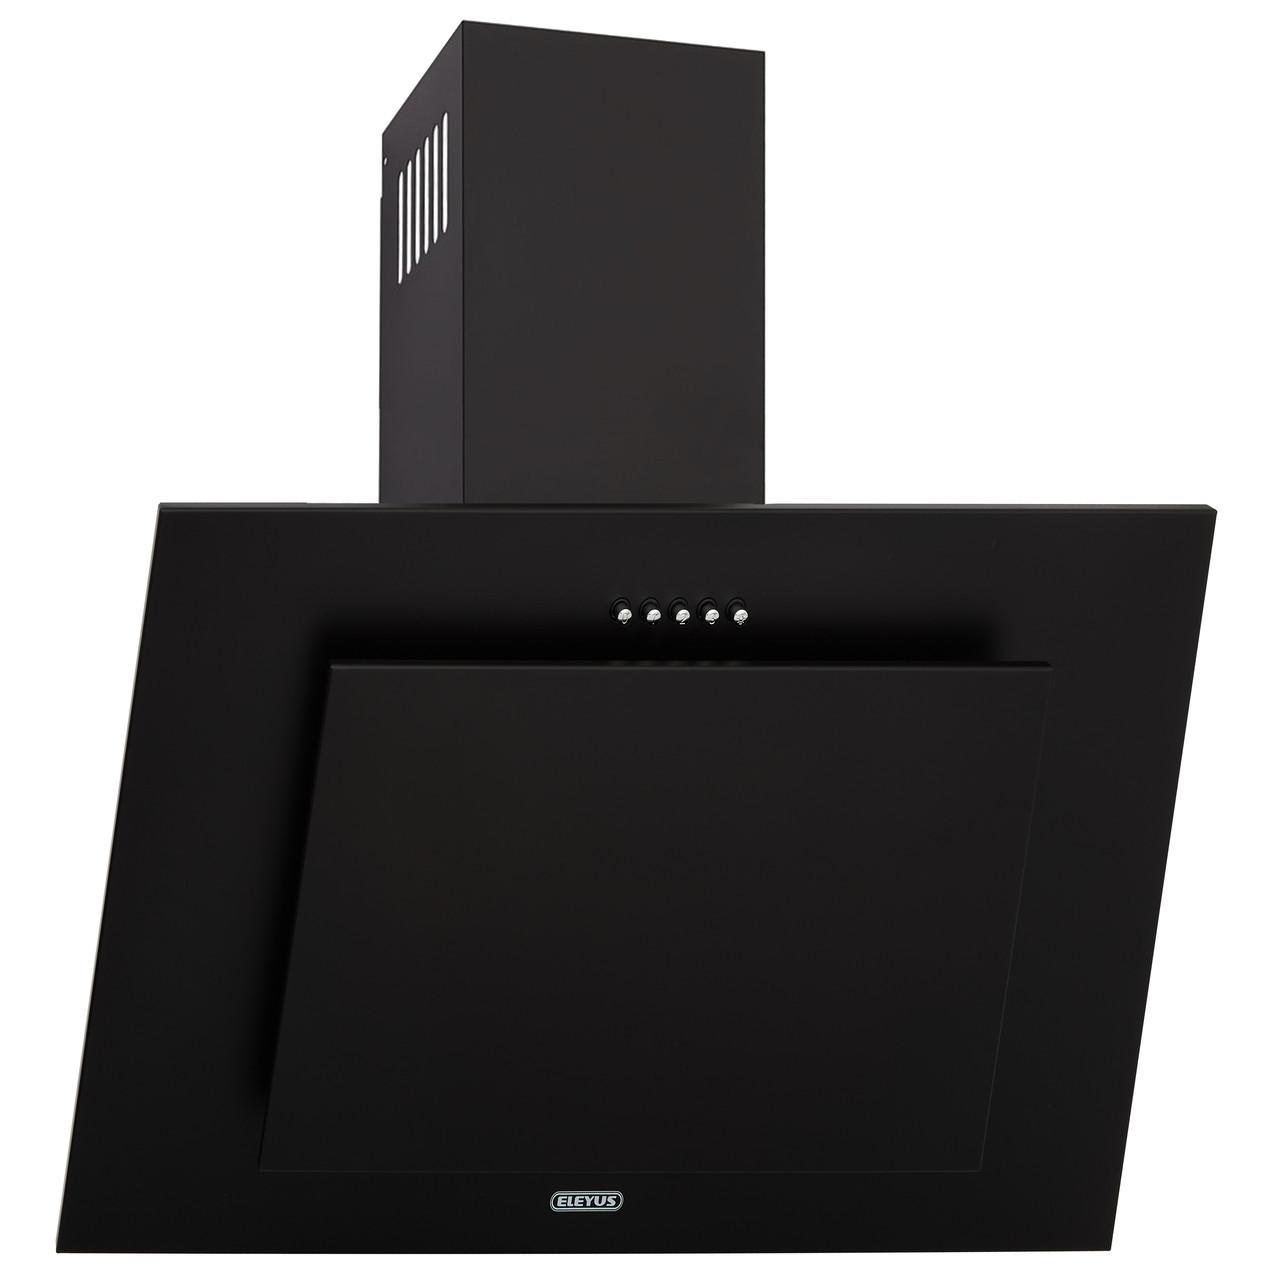 Витяжка кухонна вертикальна ELEYUS Vertical 1000 60 BL + Безкоштовна доставка!